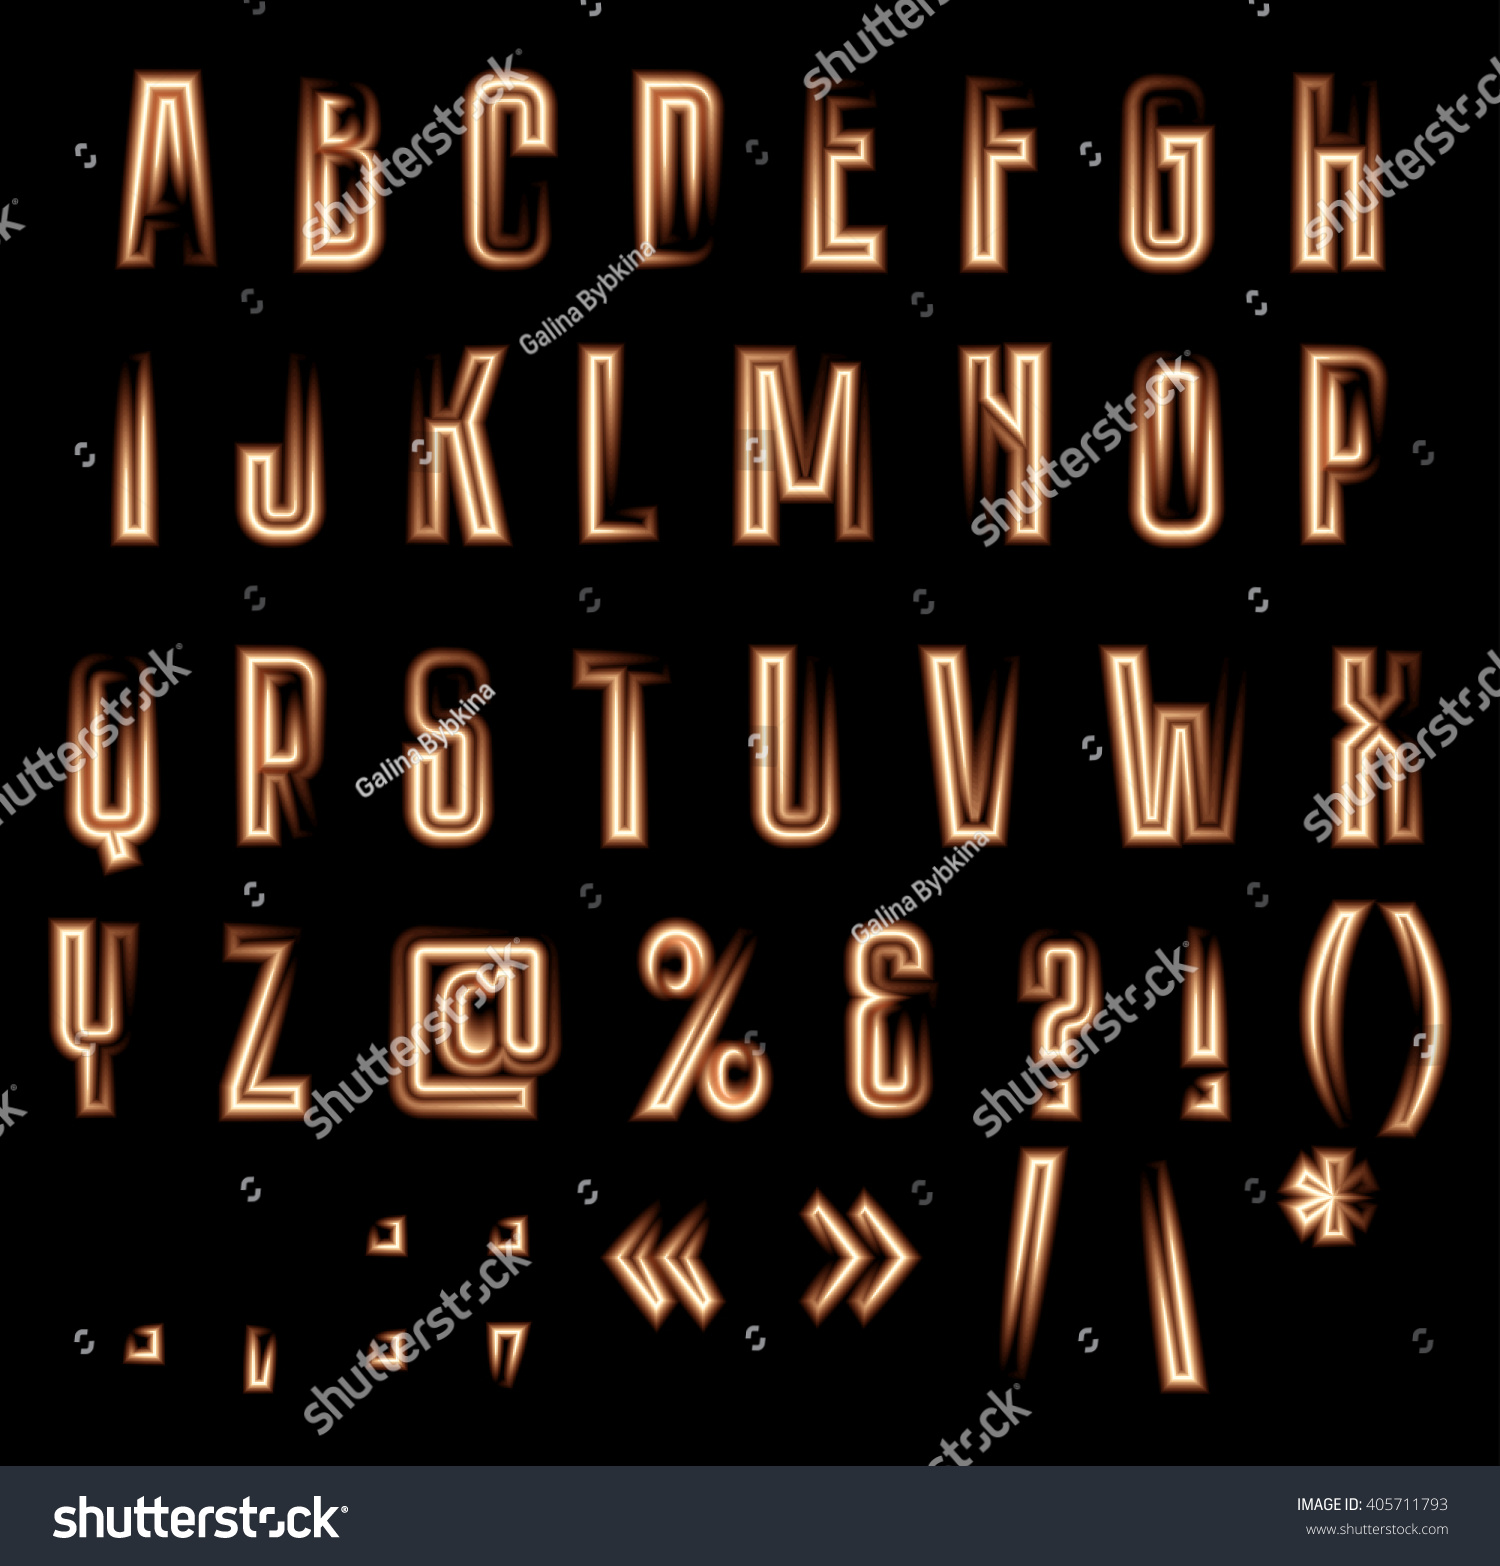 Stylish vector luminous alphabet neon letters stock vector 405711793 stylish vector luminous alphabet neon letters and symbols on black background buycottarizona Gallery